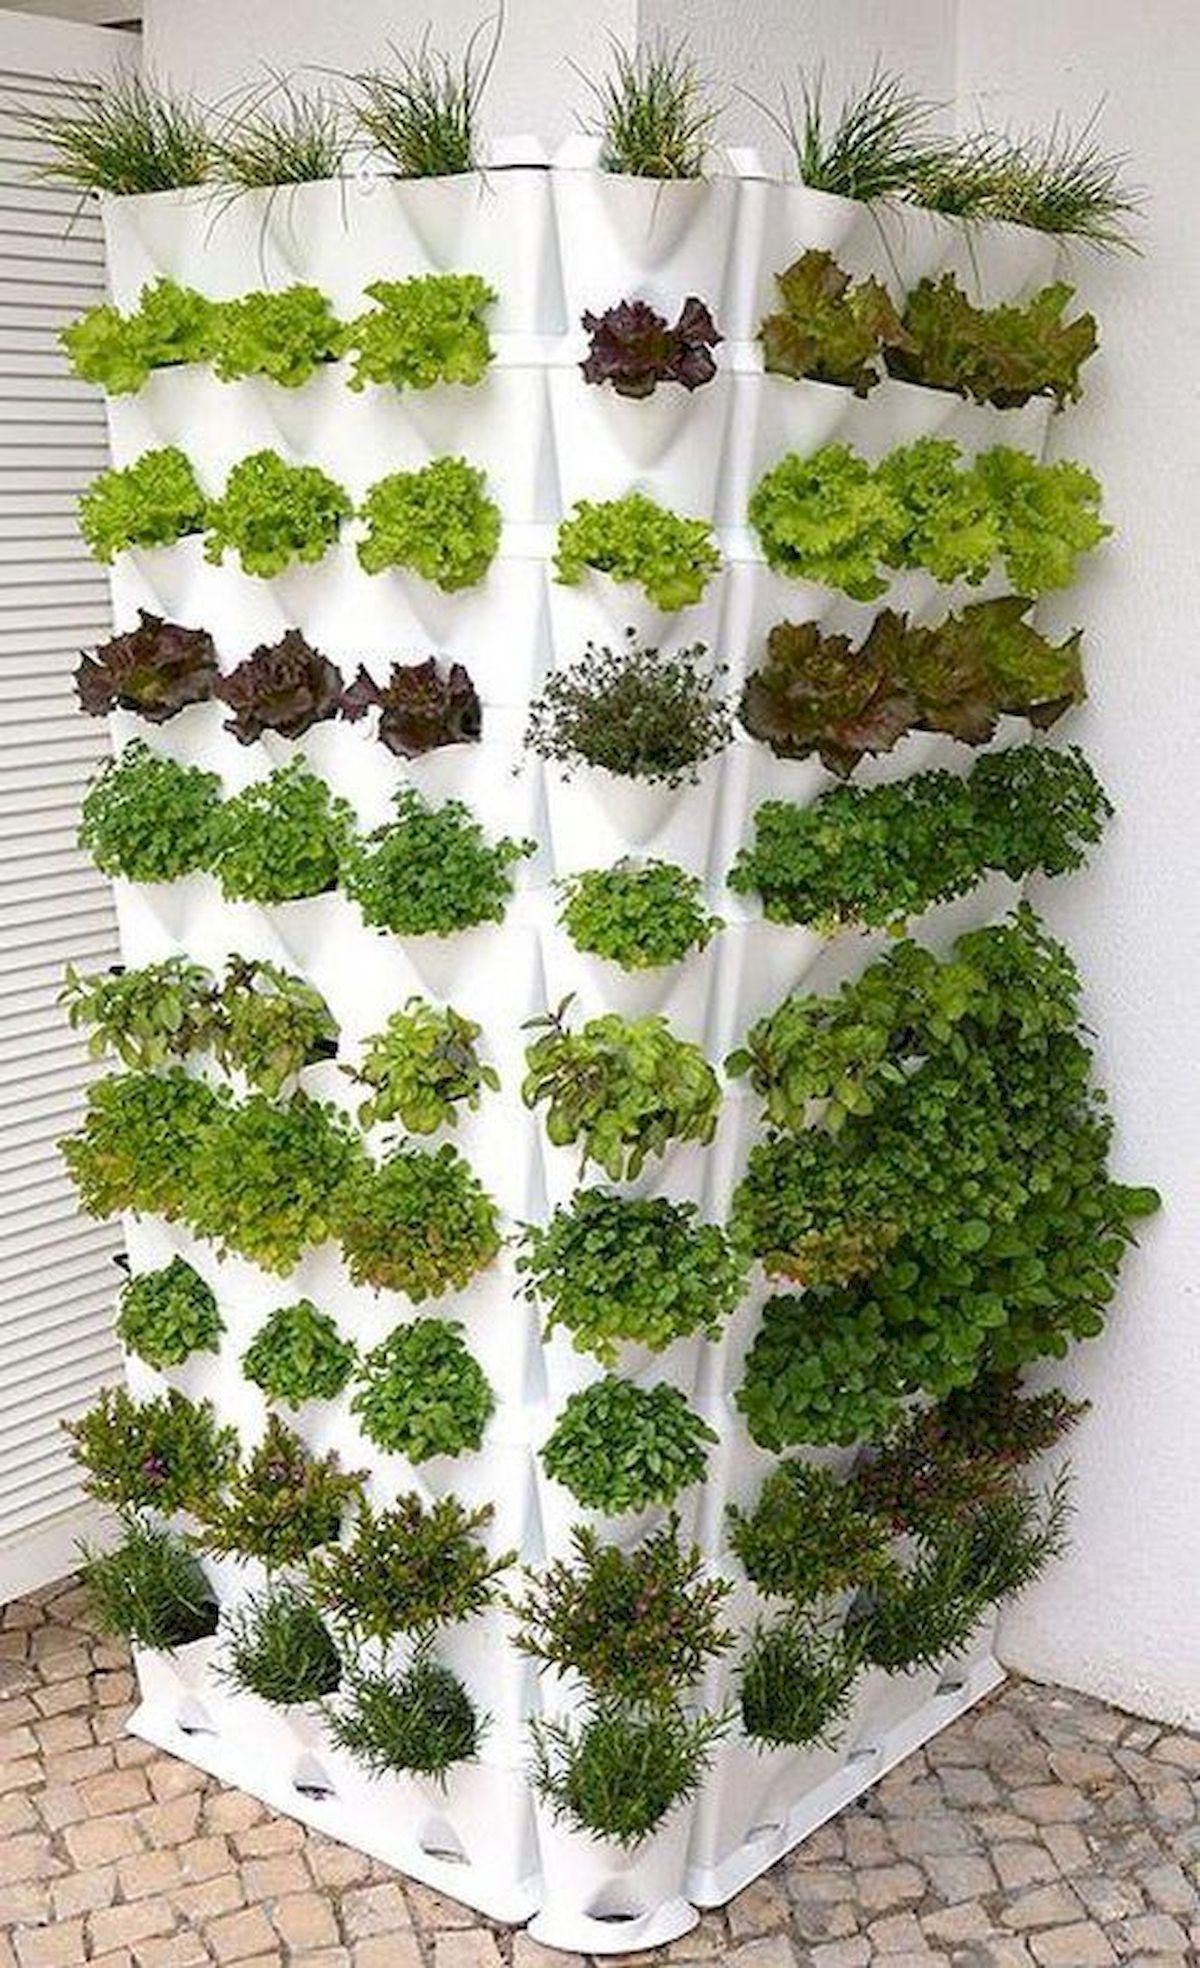 33 Best Hydroponic Gardening For Beginners Design Ideas (1